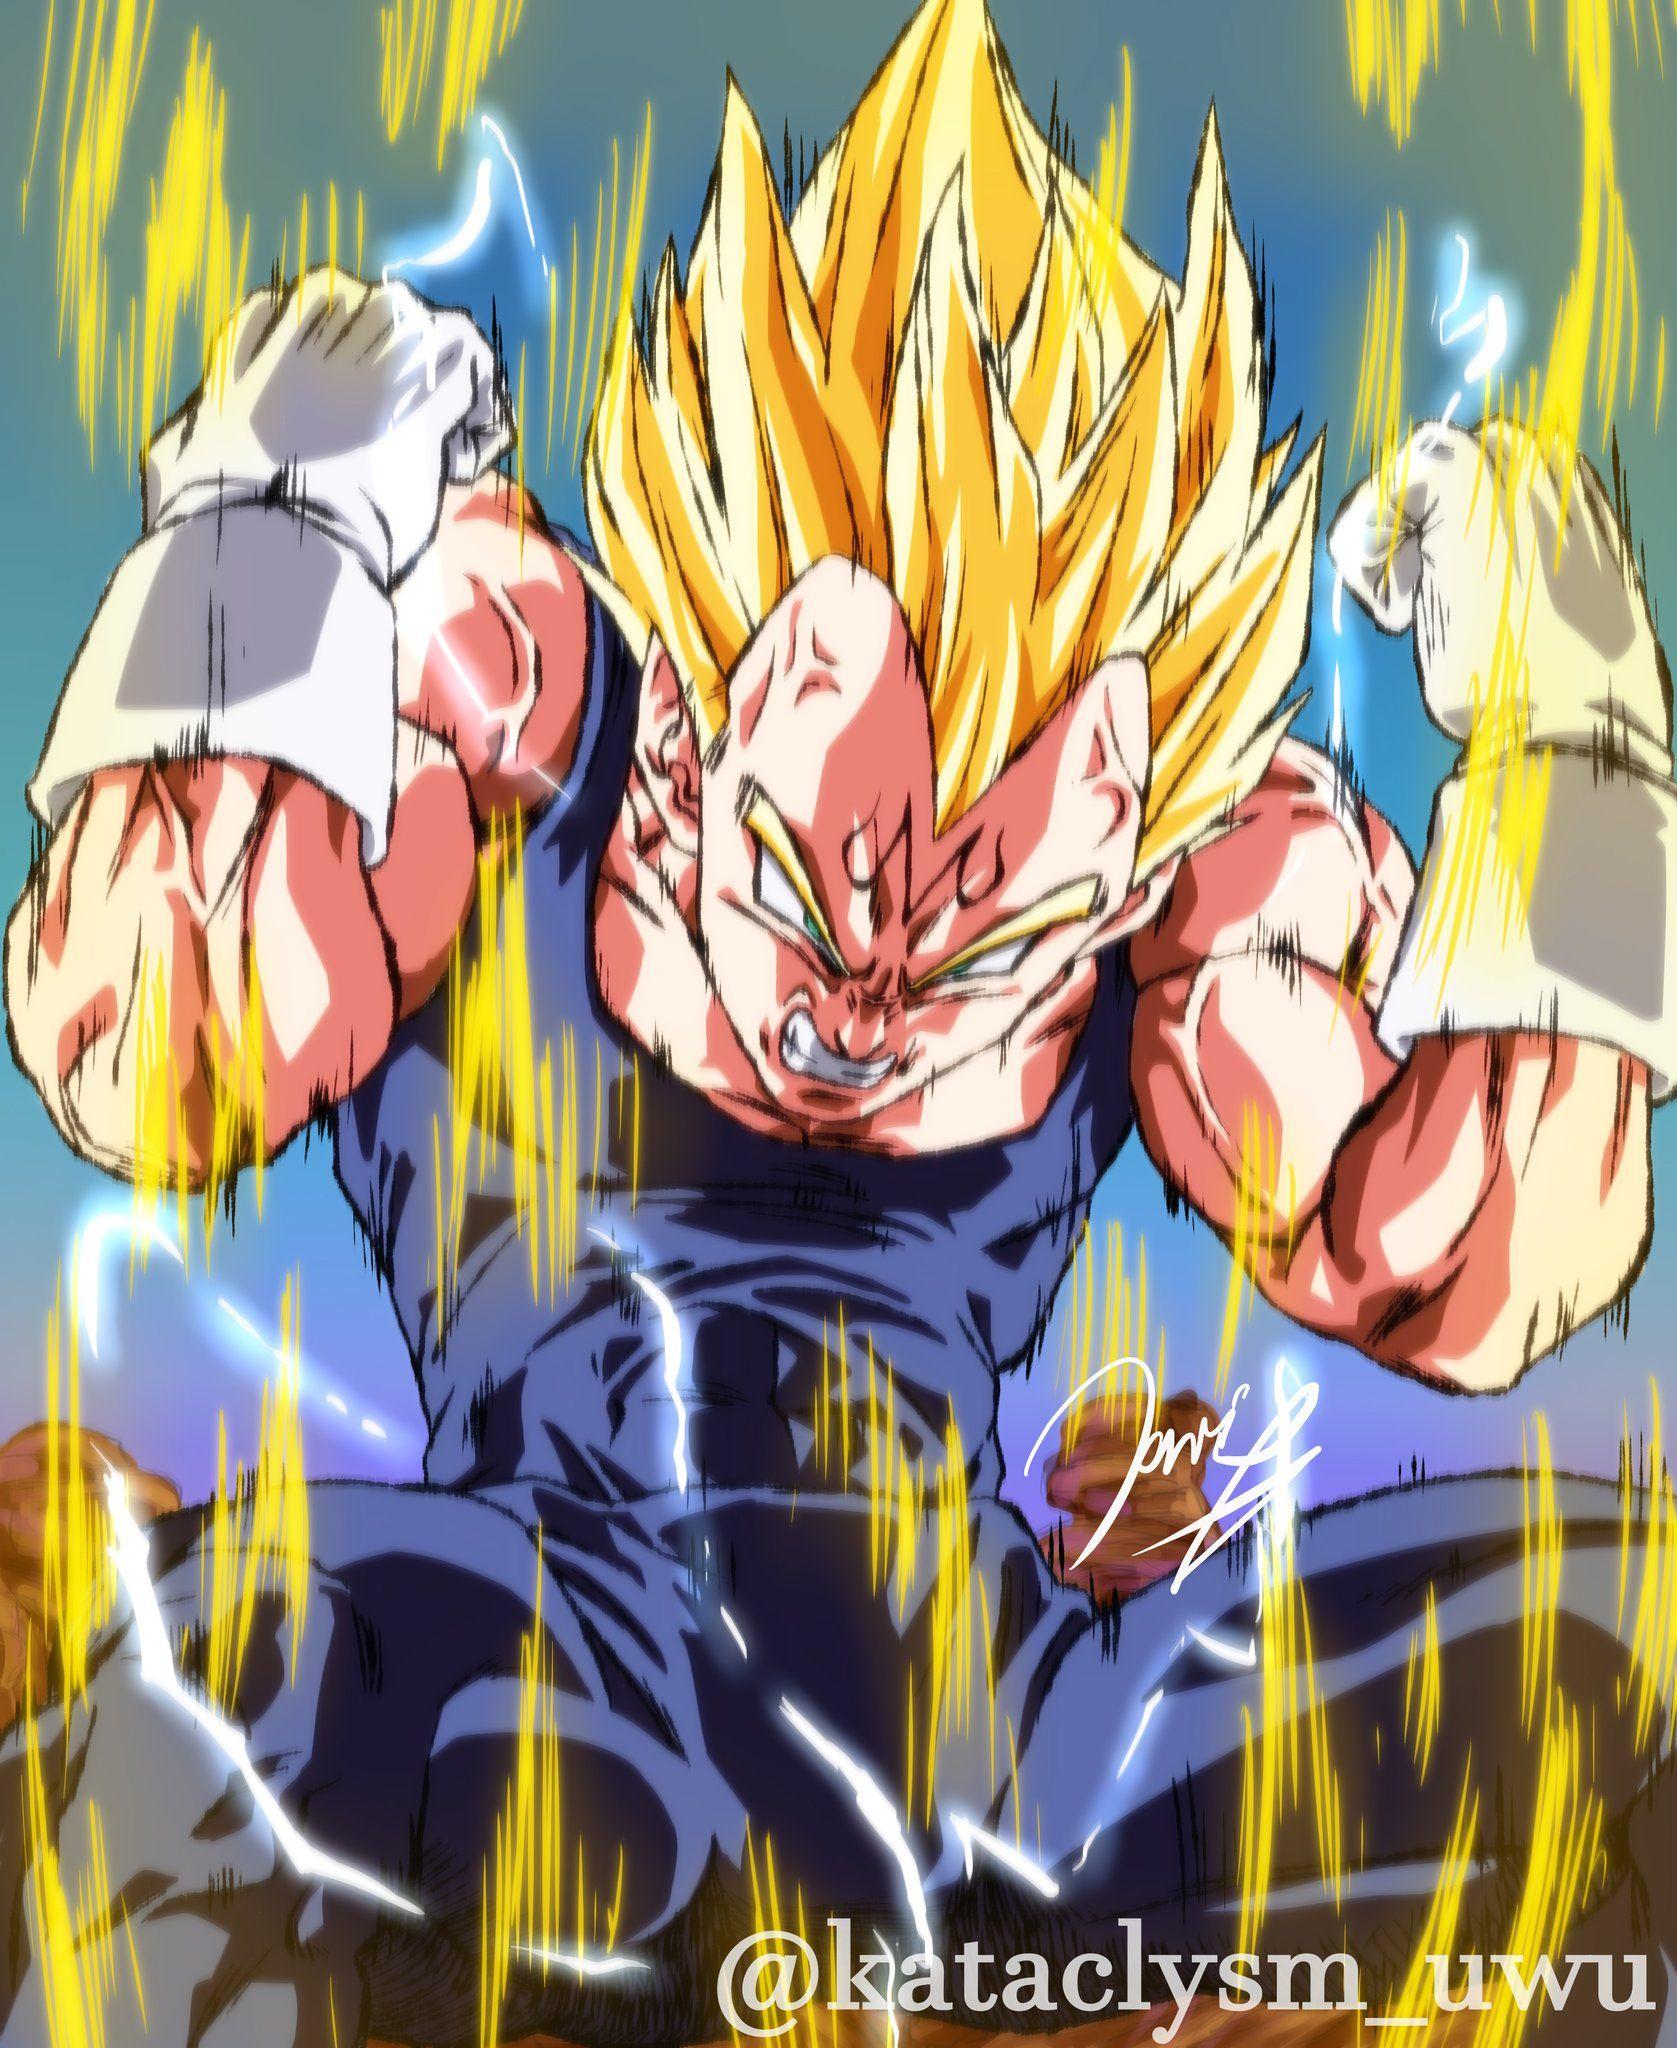 Javi On Twitter In 2020 Anime Dragon Ball Super Dragon Ball Artwork Dragon Ball Art